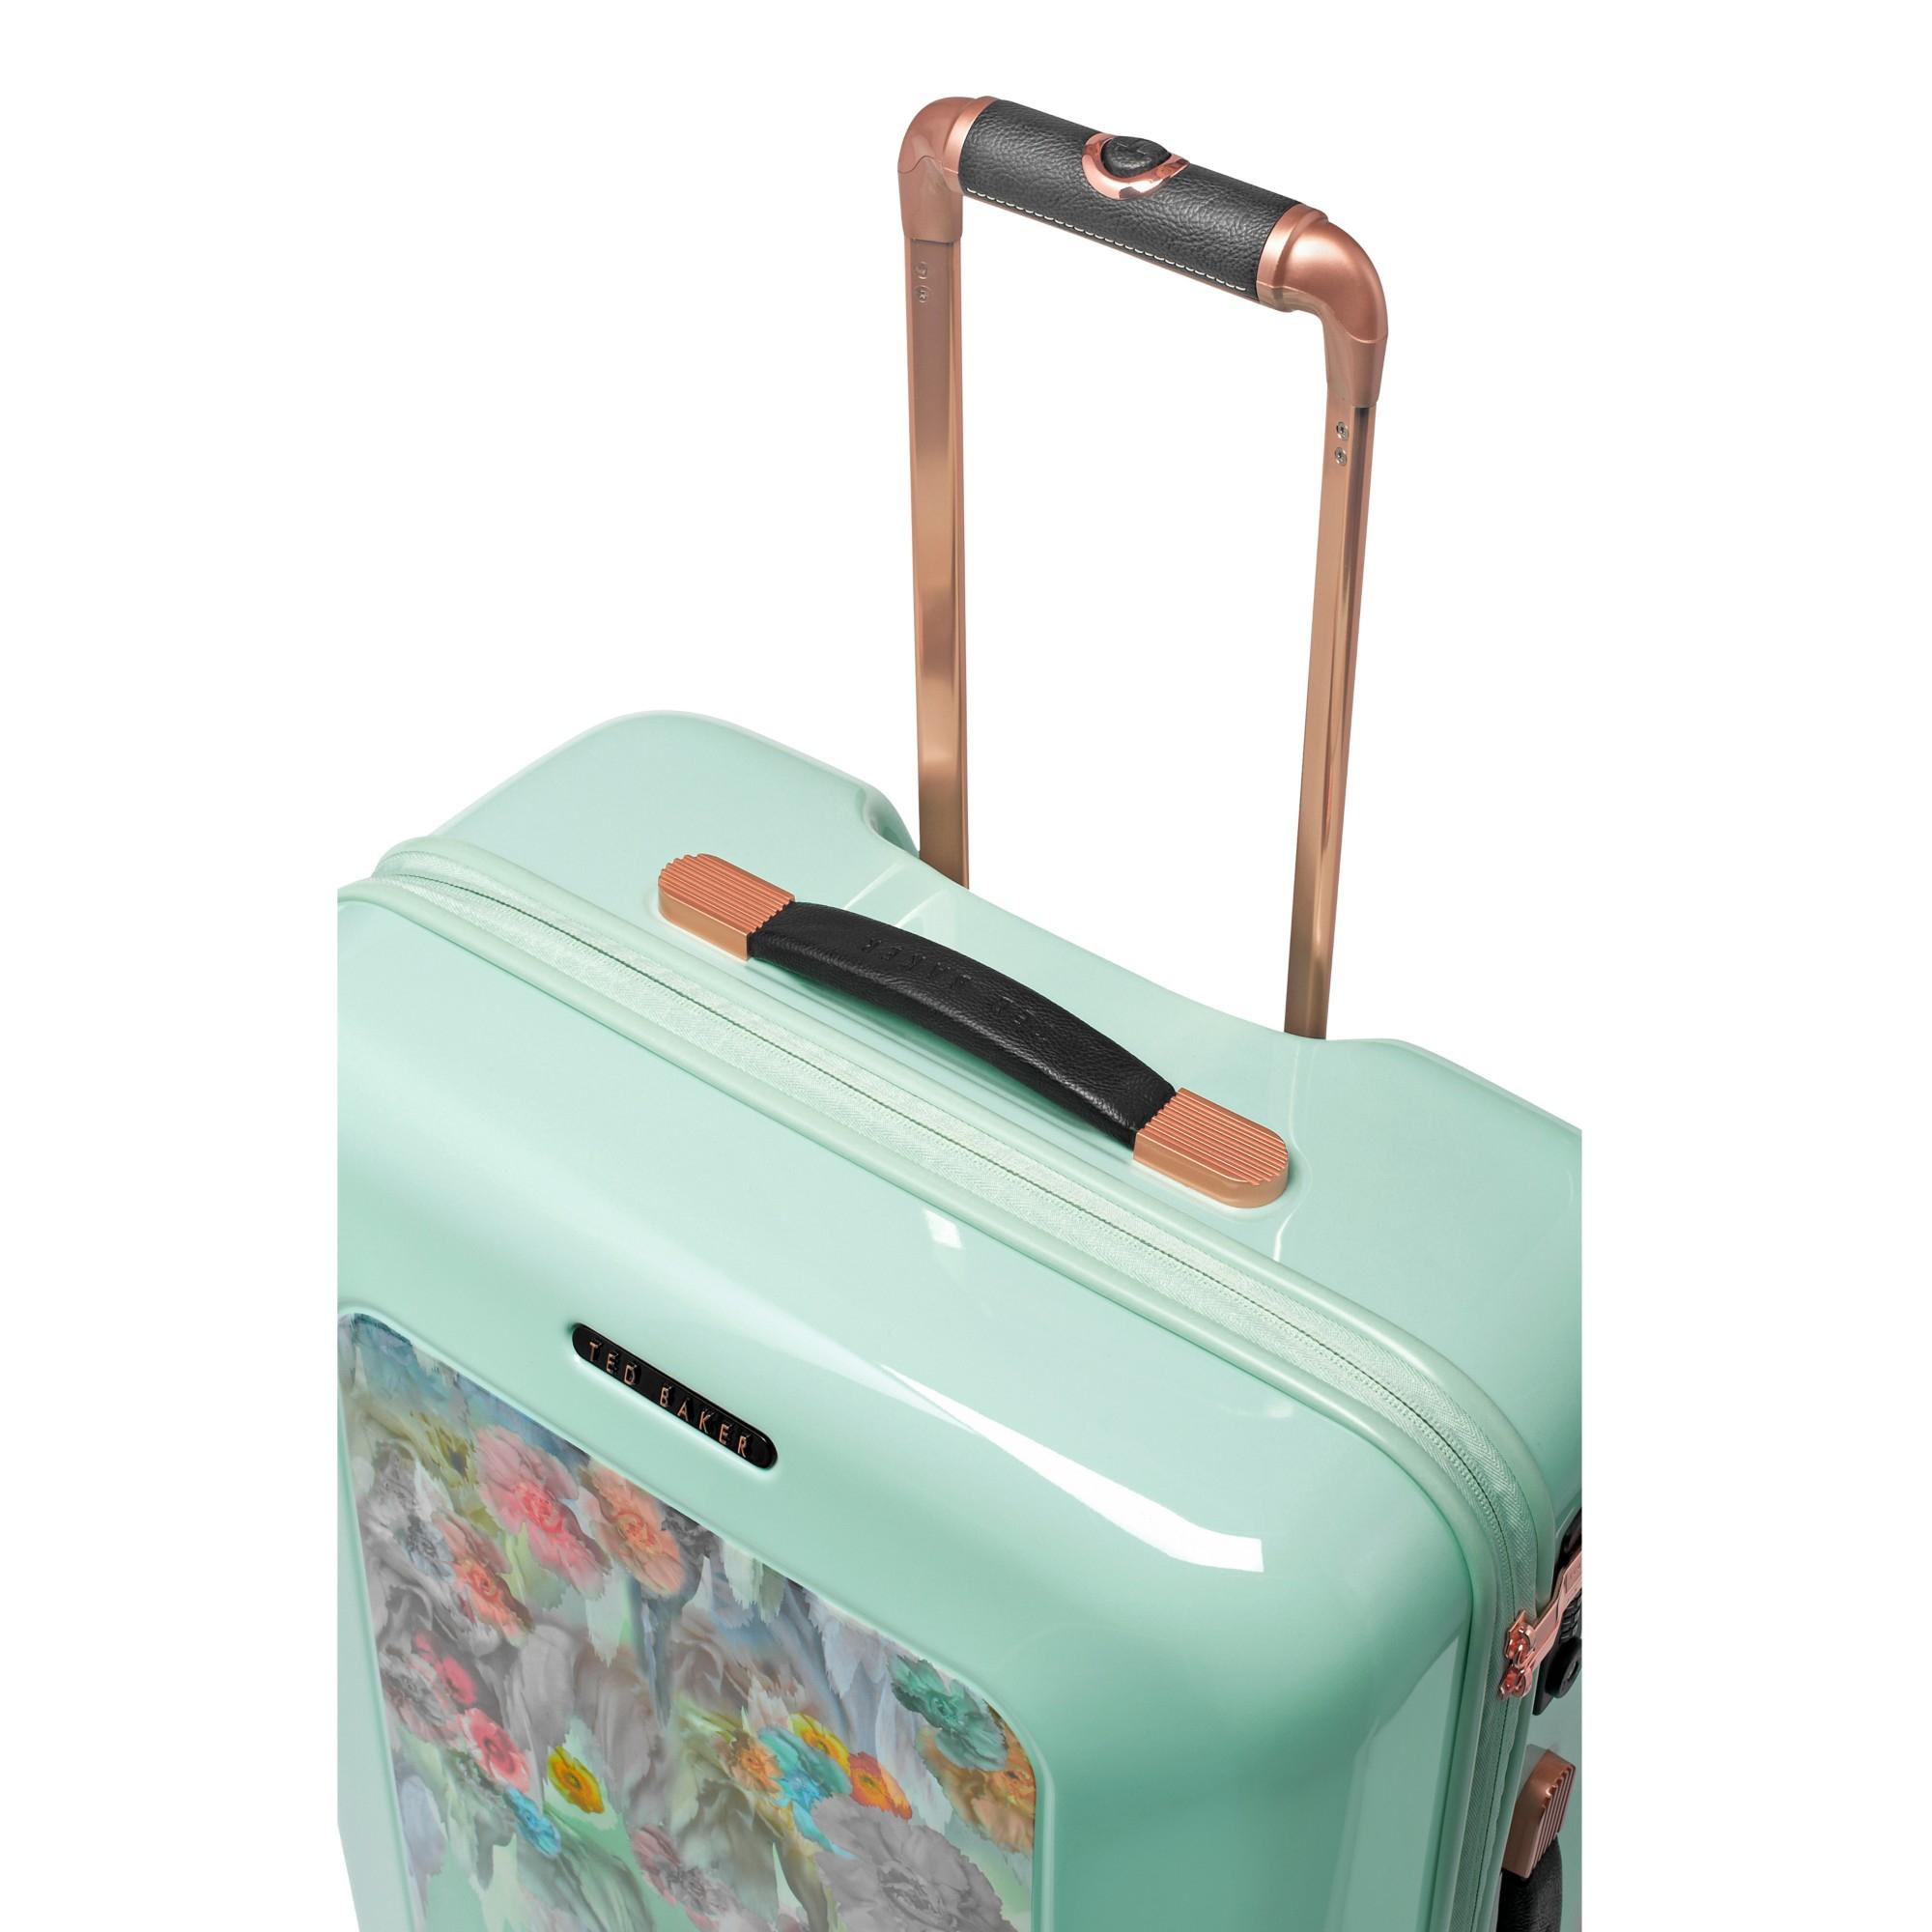 4c835aac0c744 Ted Baker Sugar Sweet 4-Wheel 69.5Cm Medium Suitcase in Green - Lyst